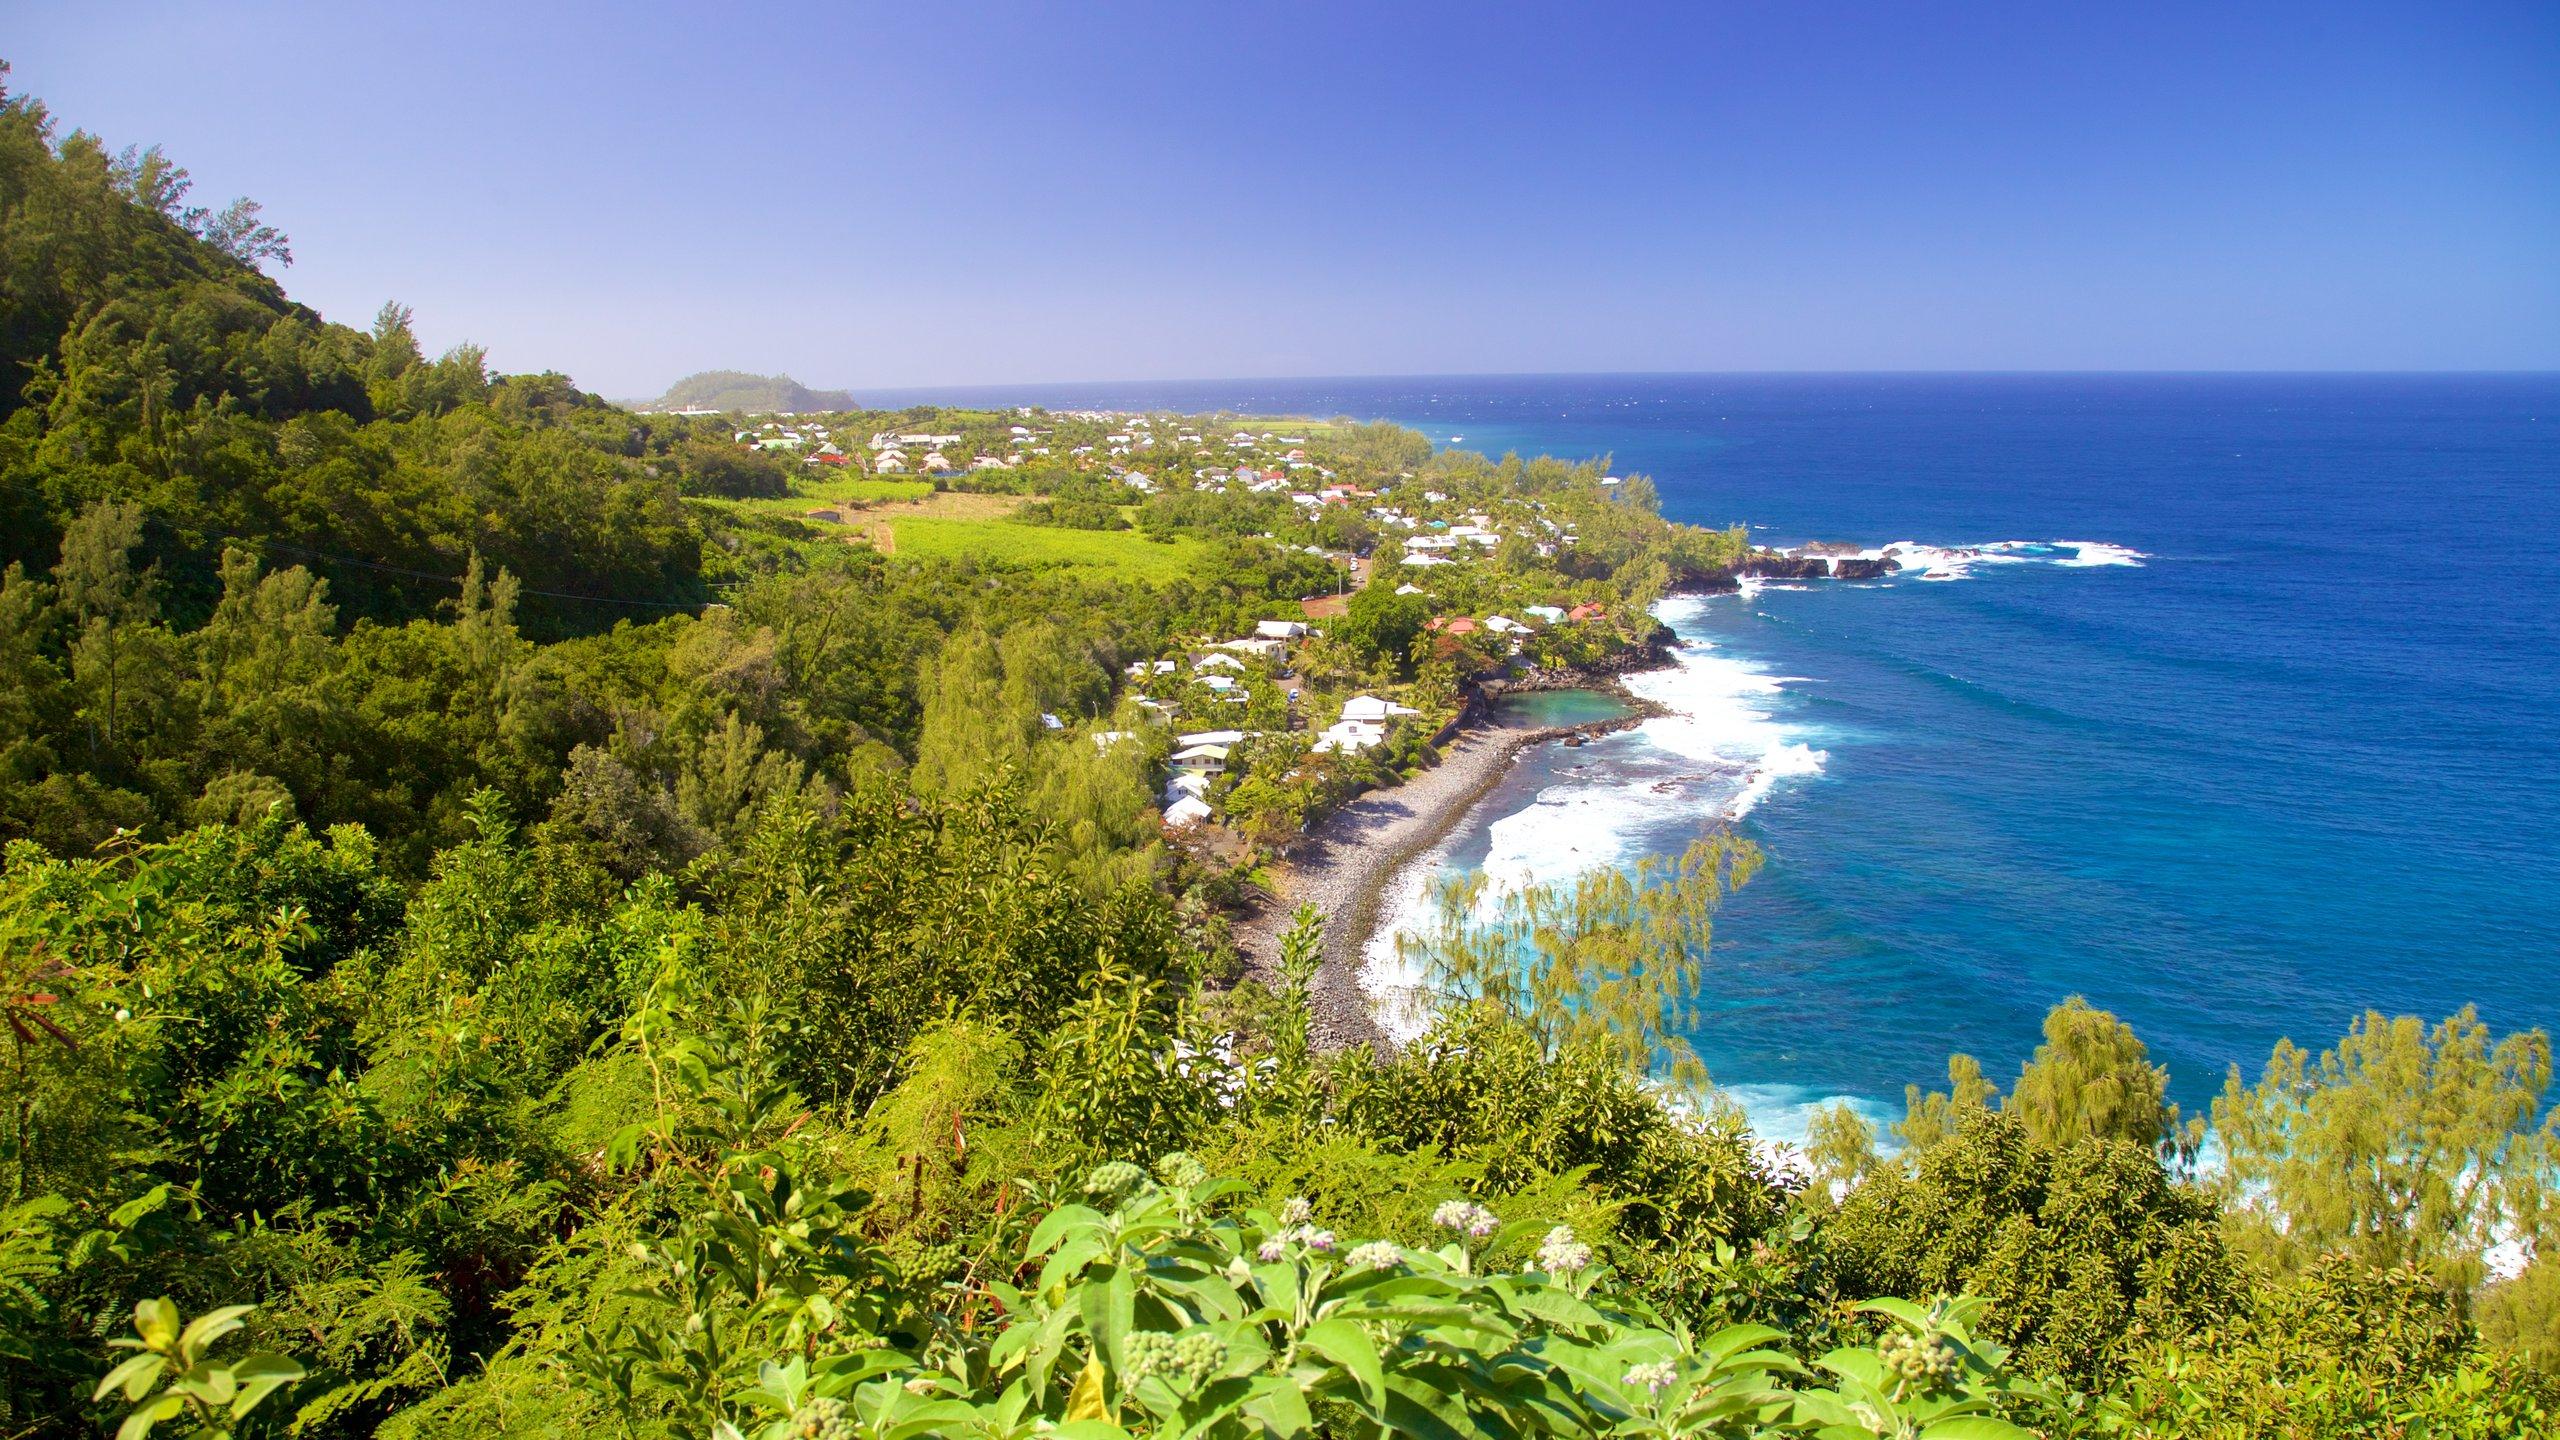 Petite-Ile, Arrondissement of Saint-Pierre, Reunion